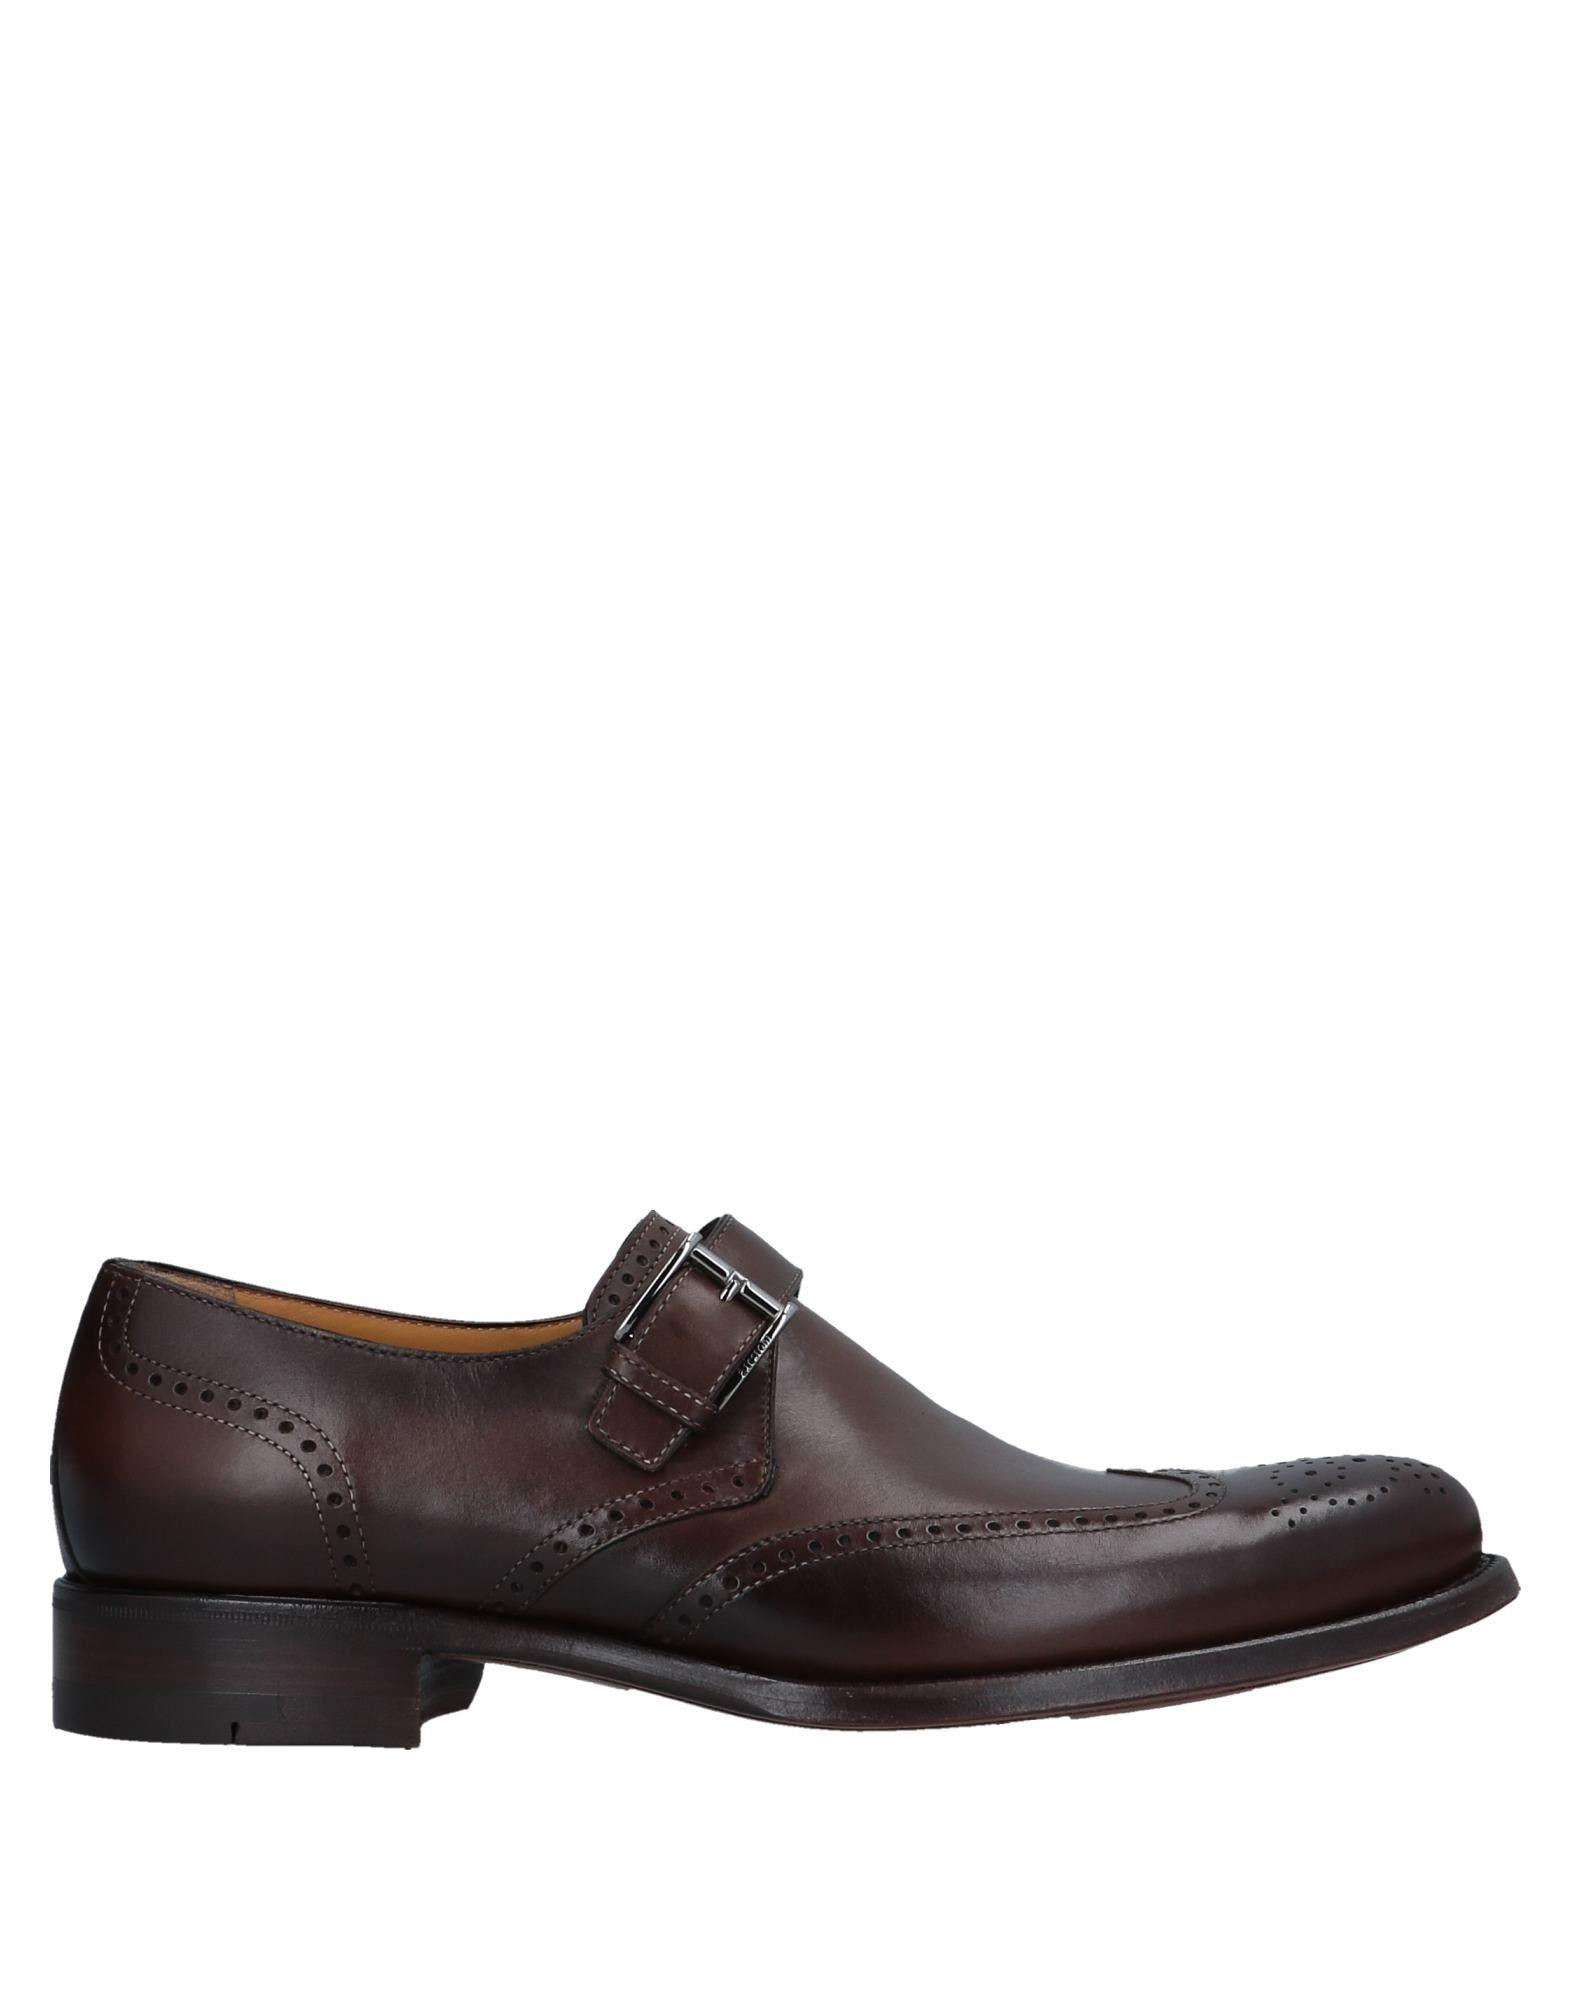 A.Testoni Mokassins Herren  11542500BD Gute Qualität beliebte Schuhe